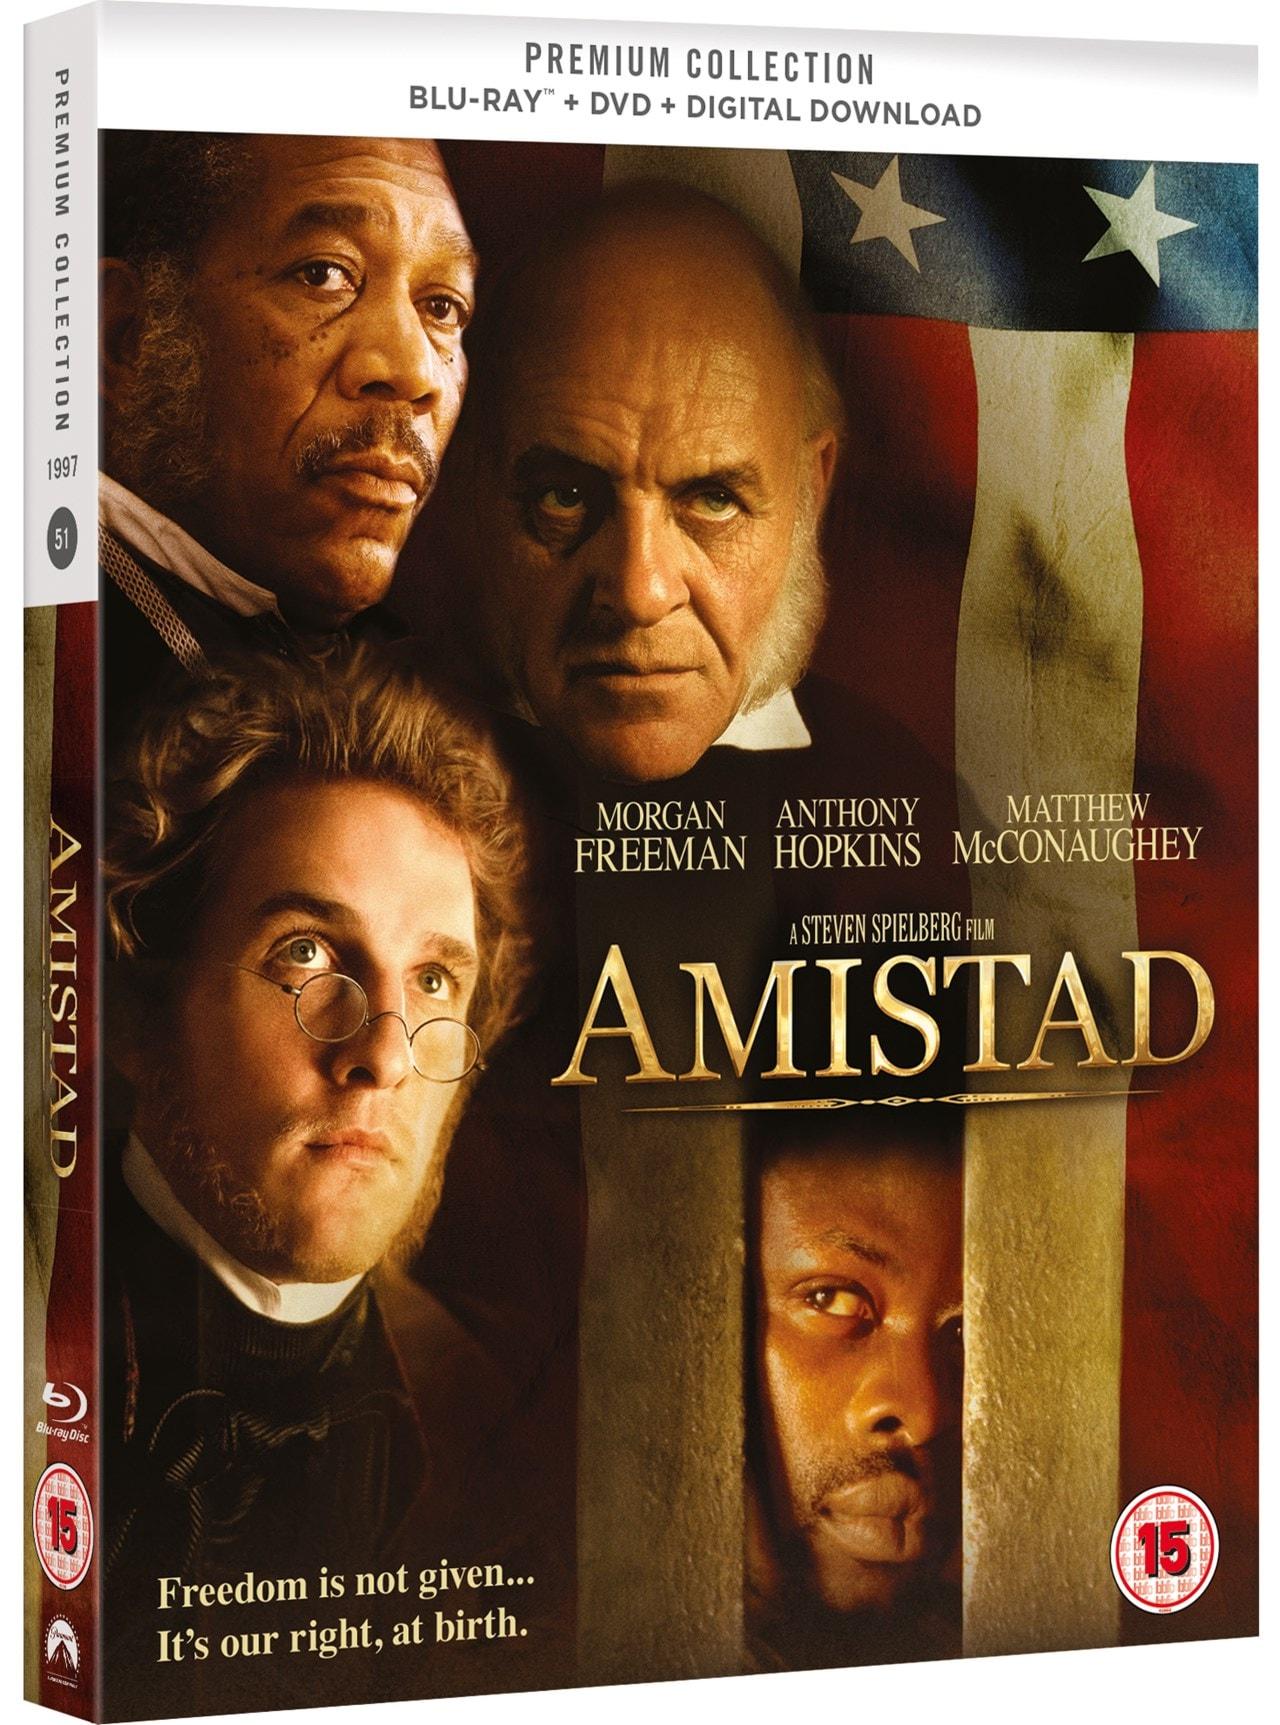 Amistad (hmv Exclusive) - The Premium Collection - 2